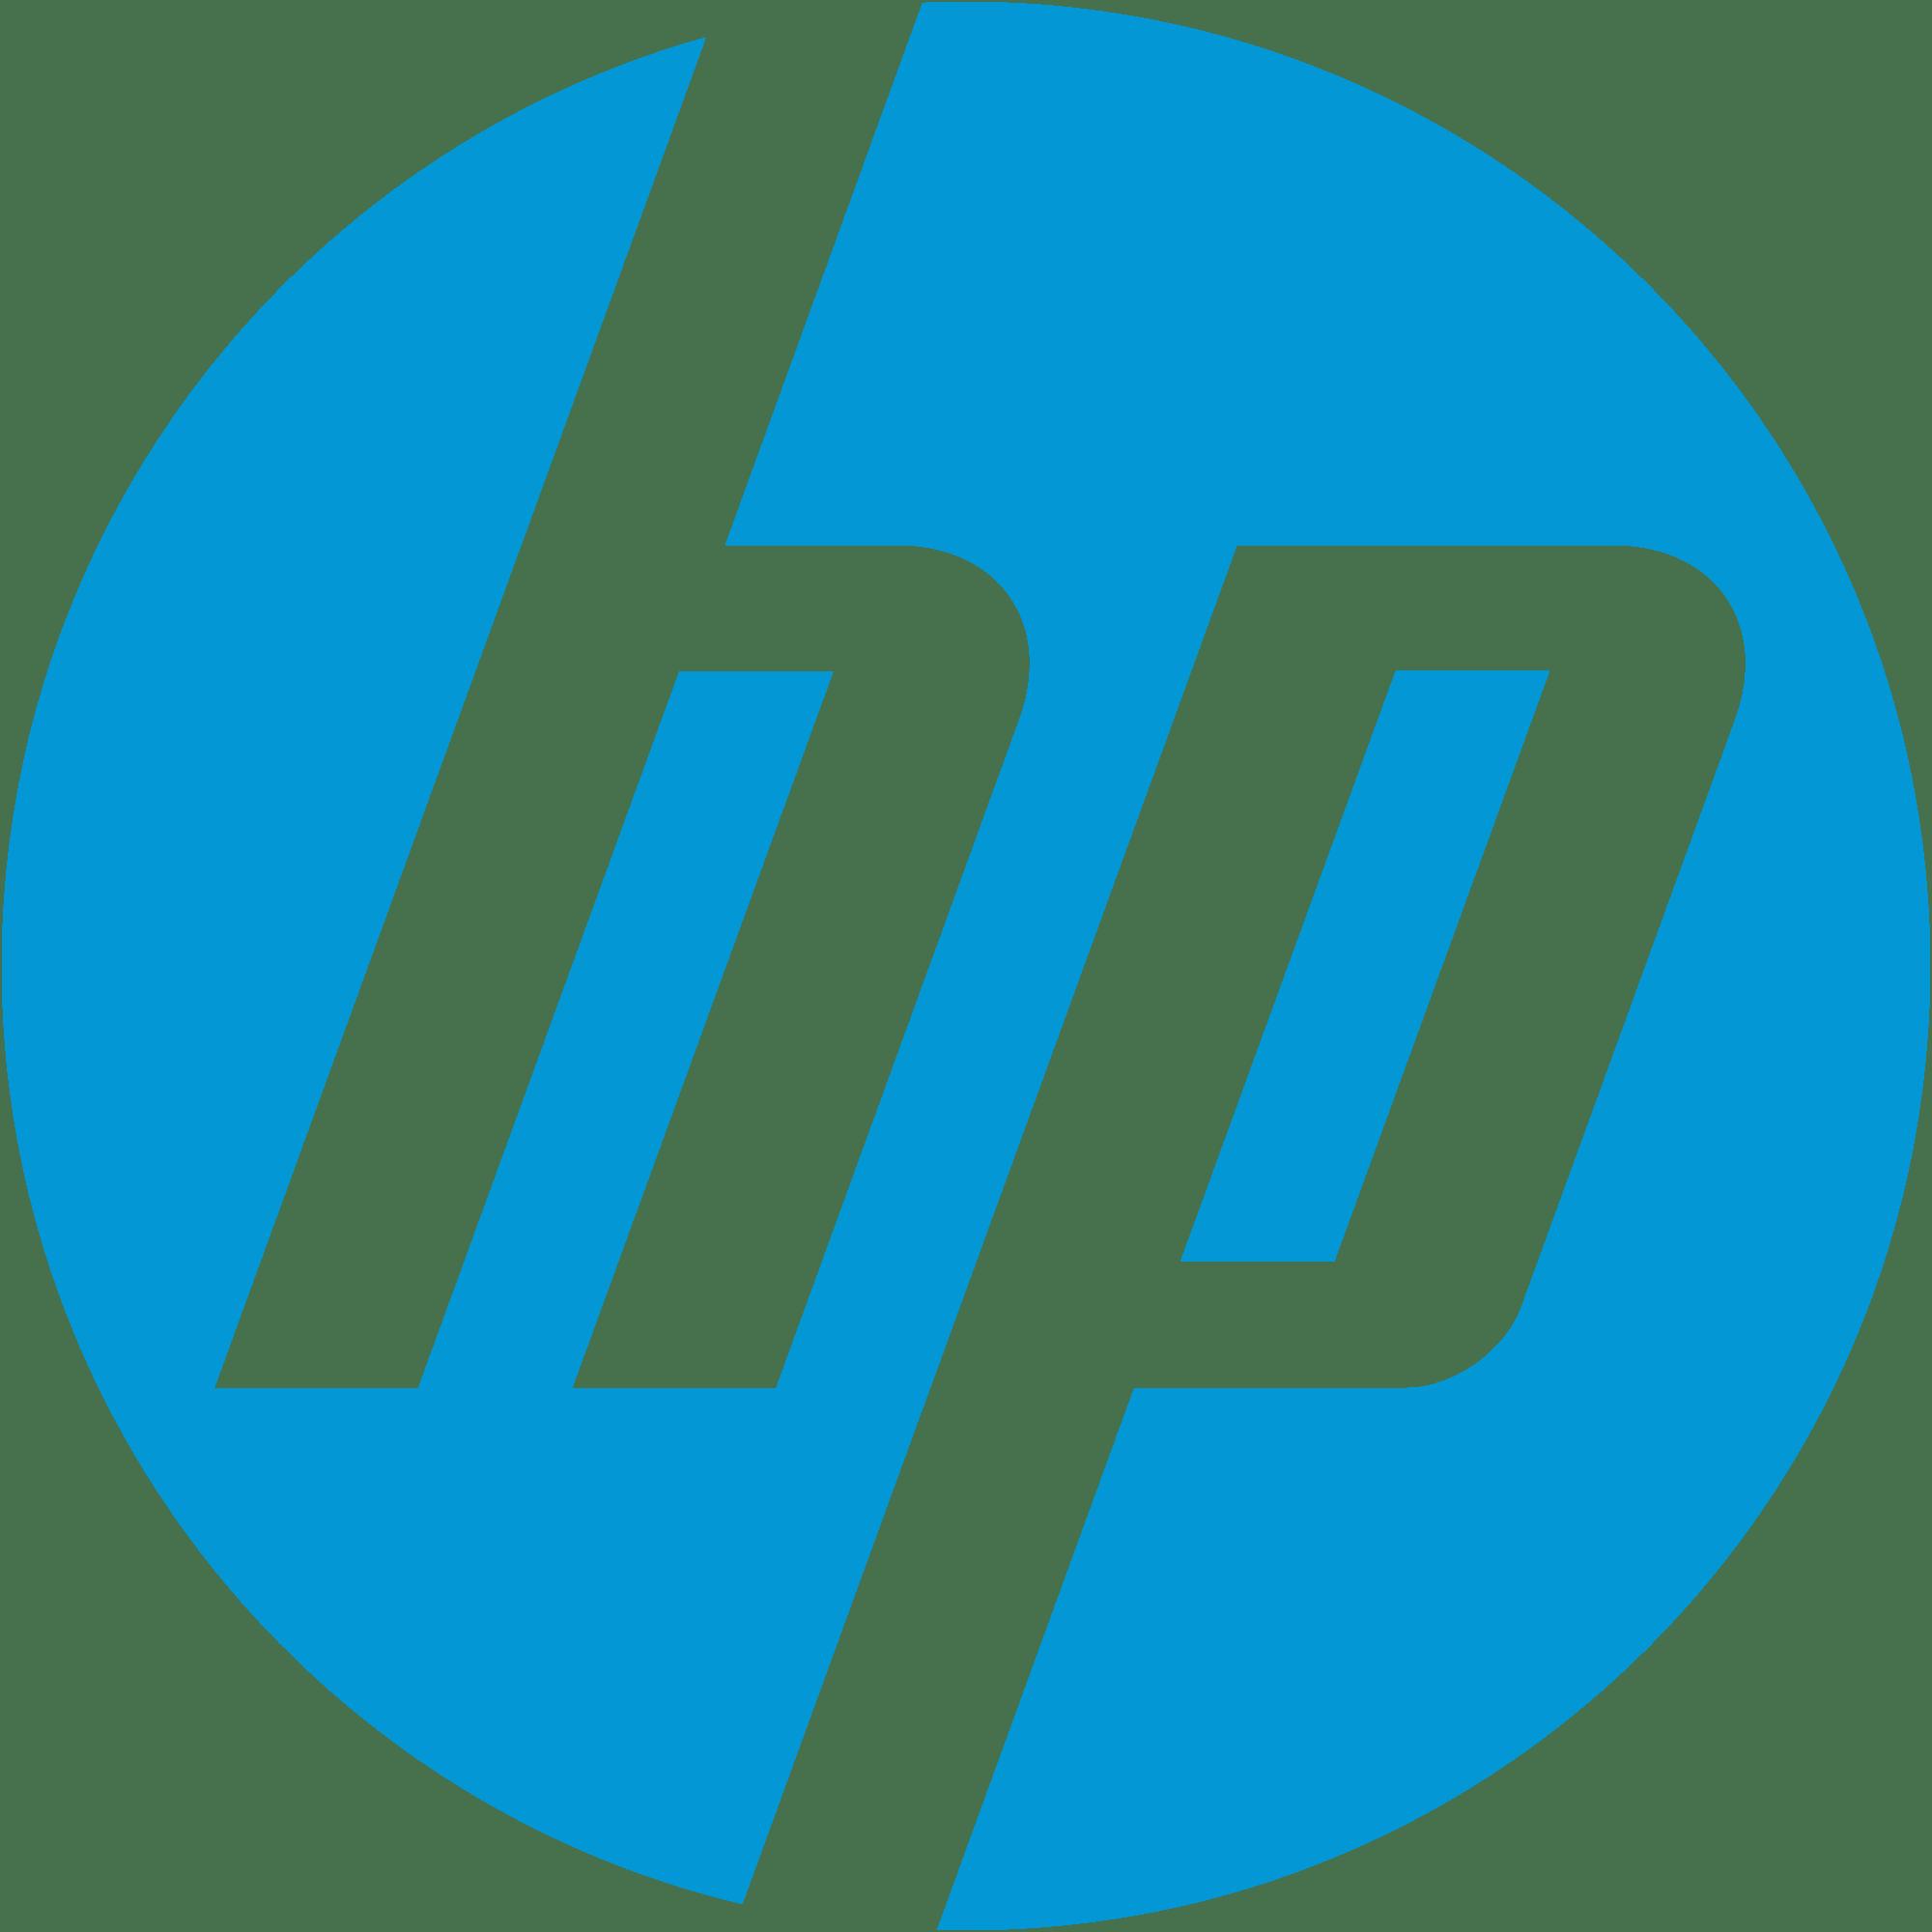 2015 Hewlett Packard (HP) International Sales Graduate ...